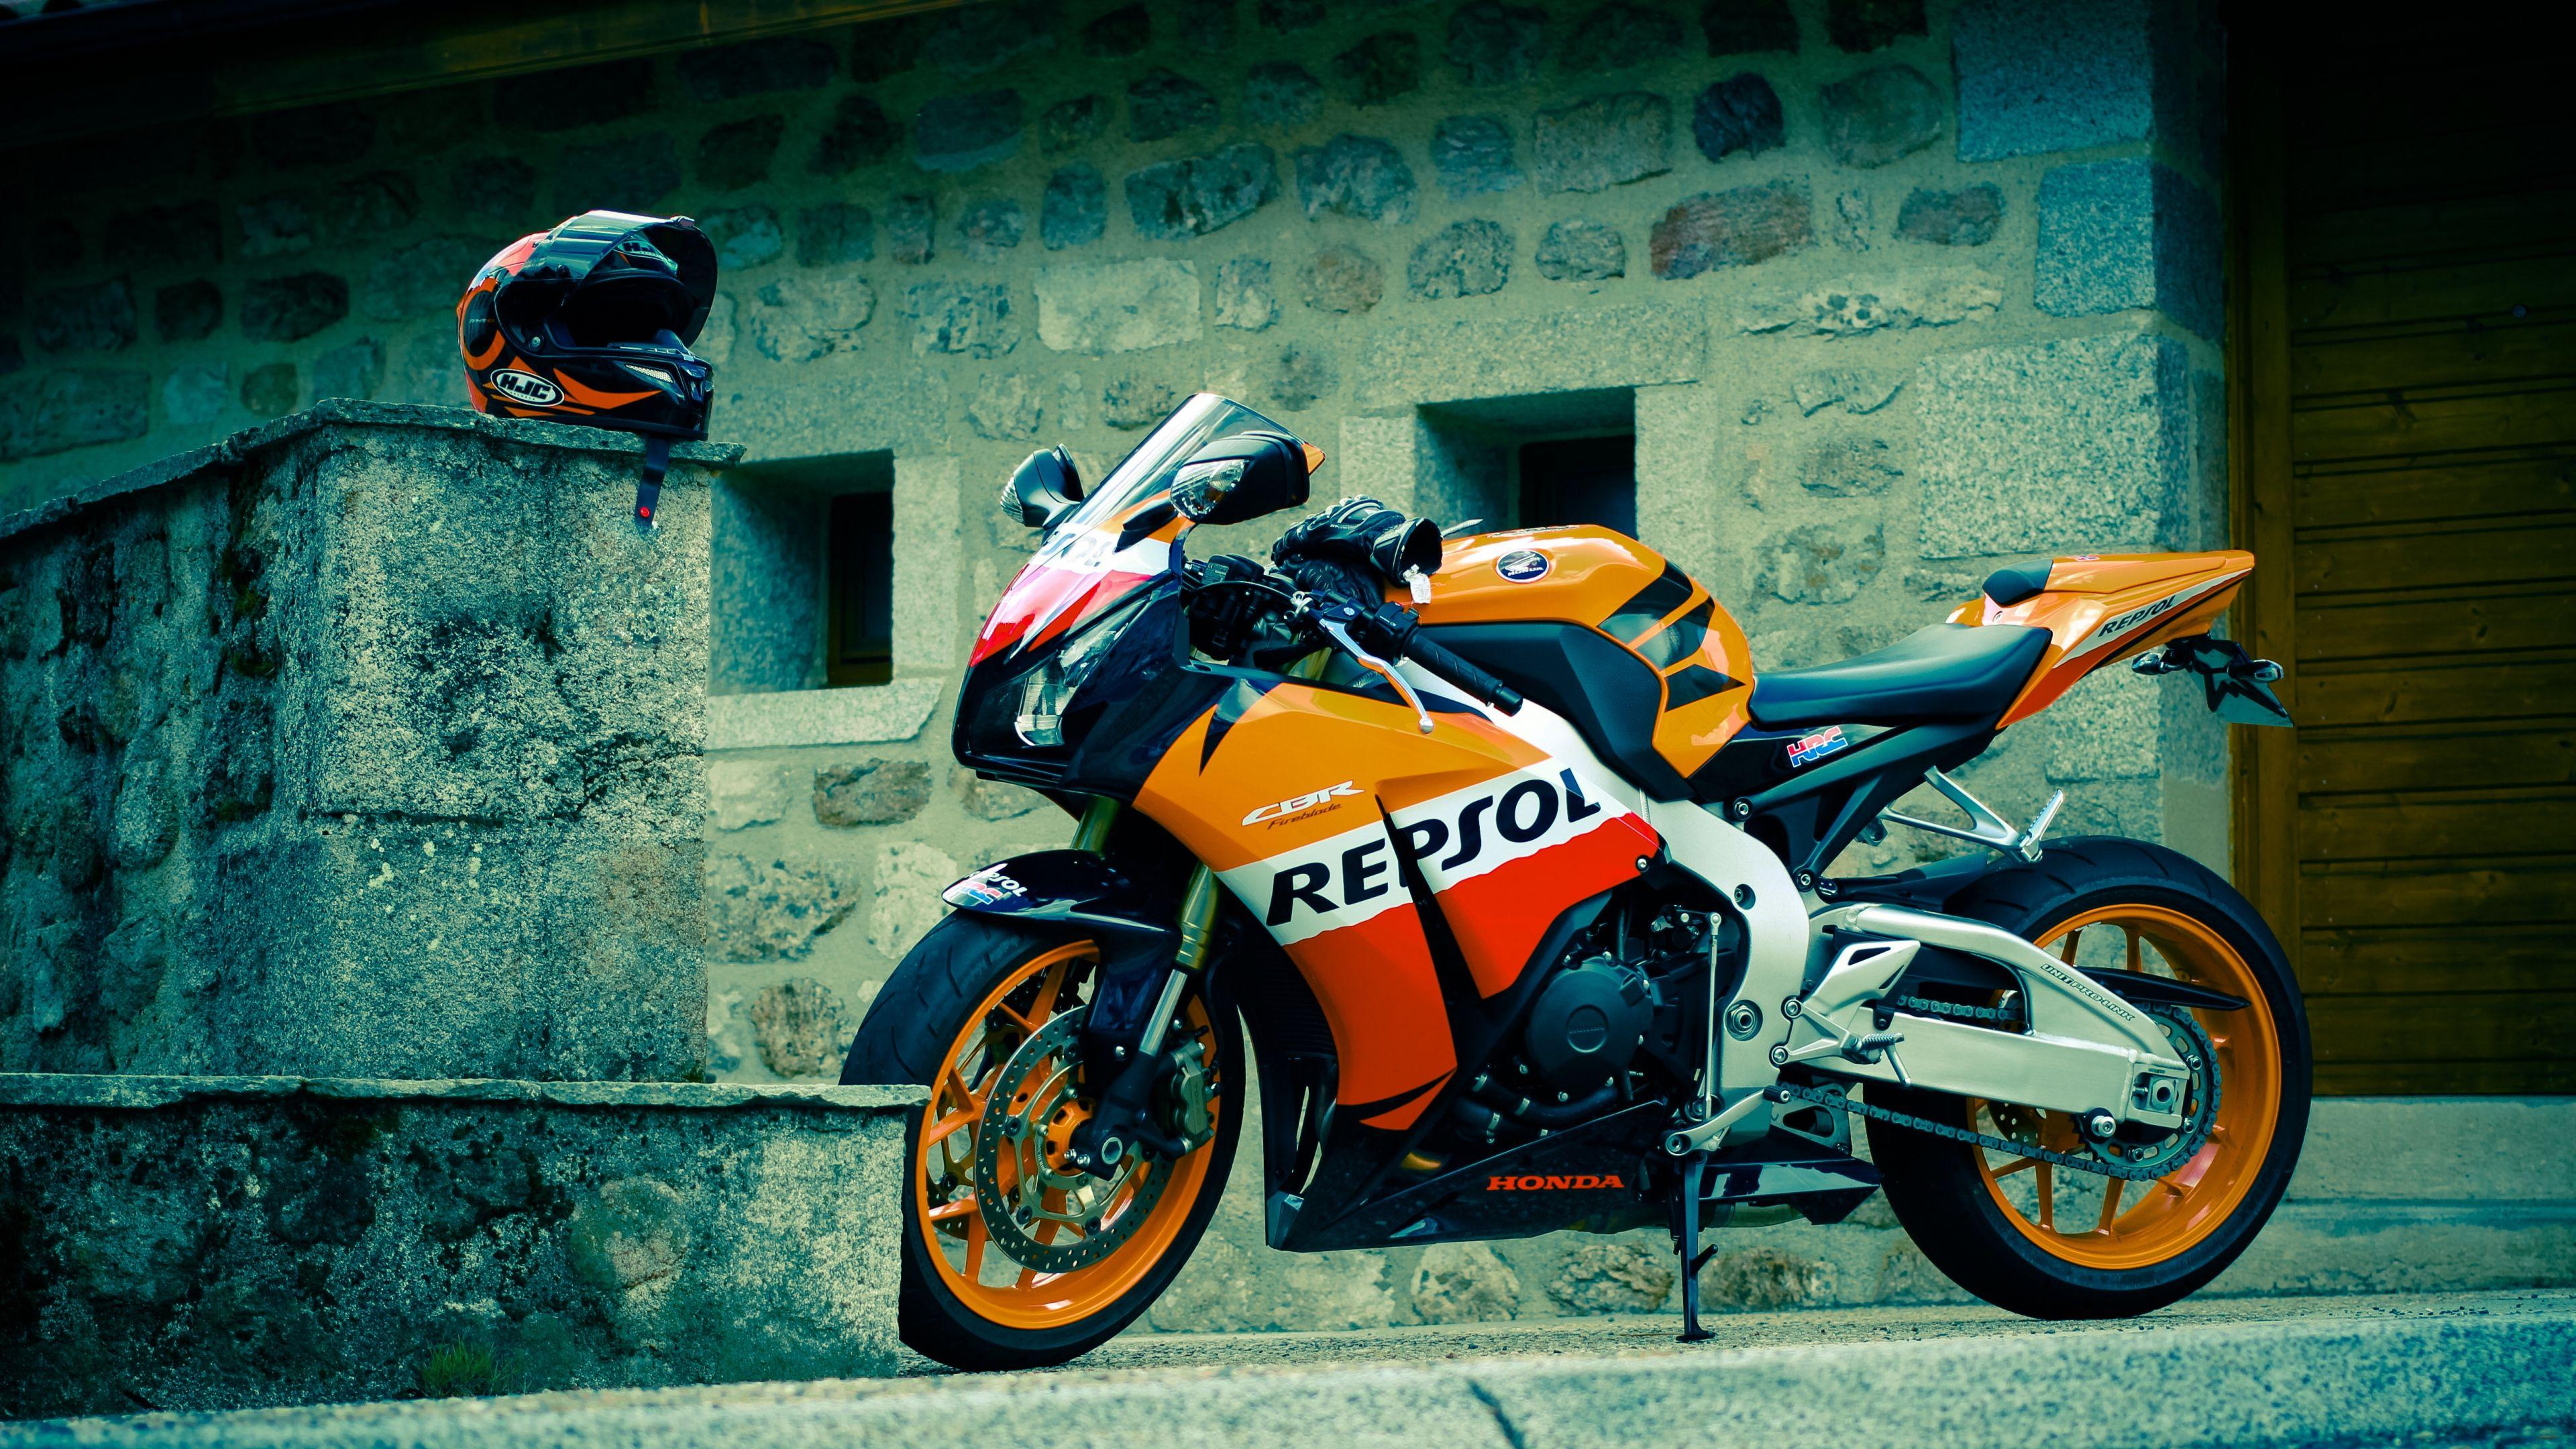 Honda CBR Repsol Wallpapers   Top Honda CBR Repsol 3840x2160